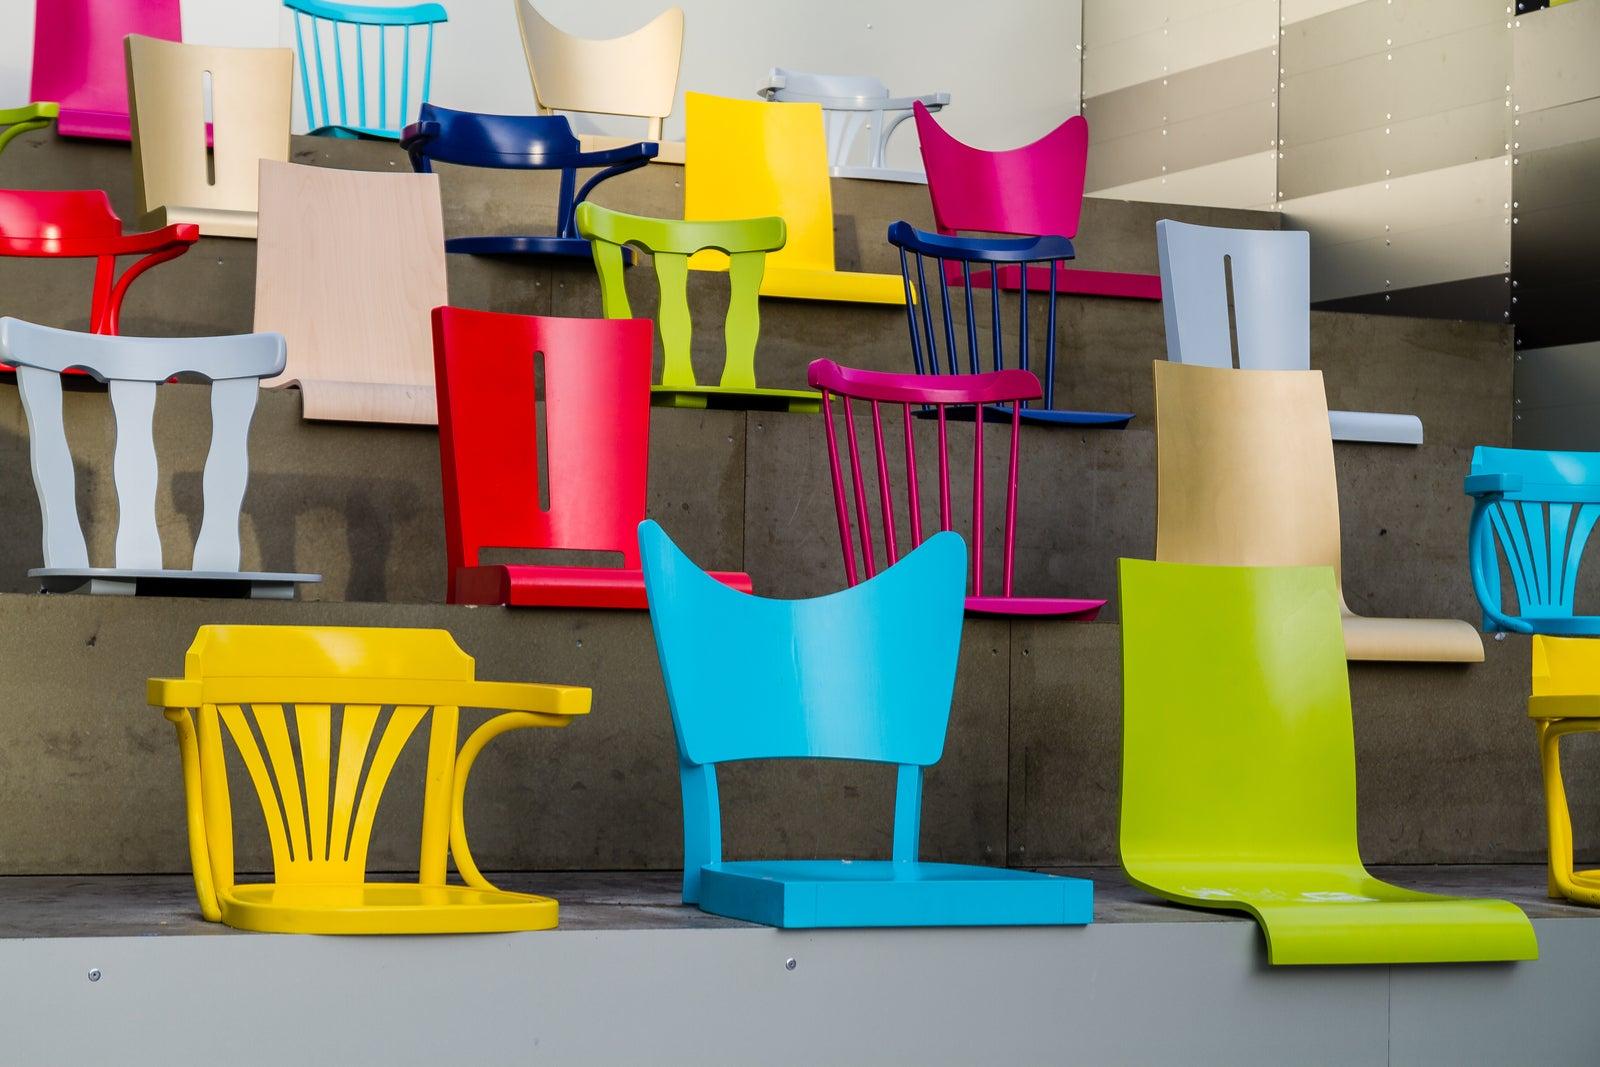 5 ideas para decorar con sillas